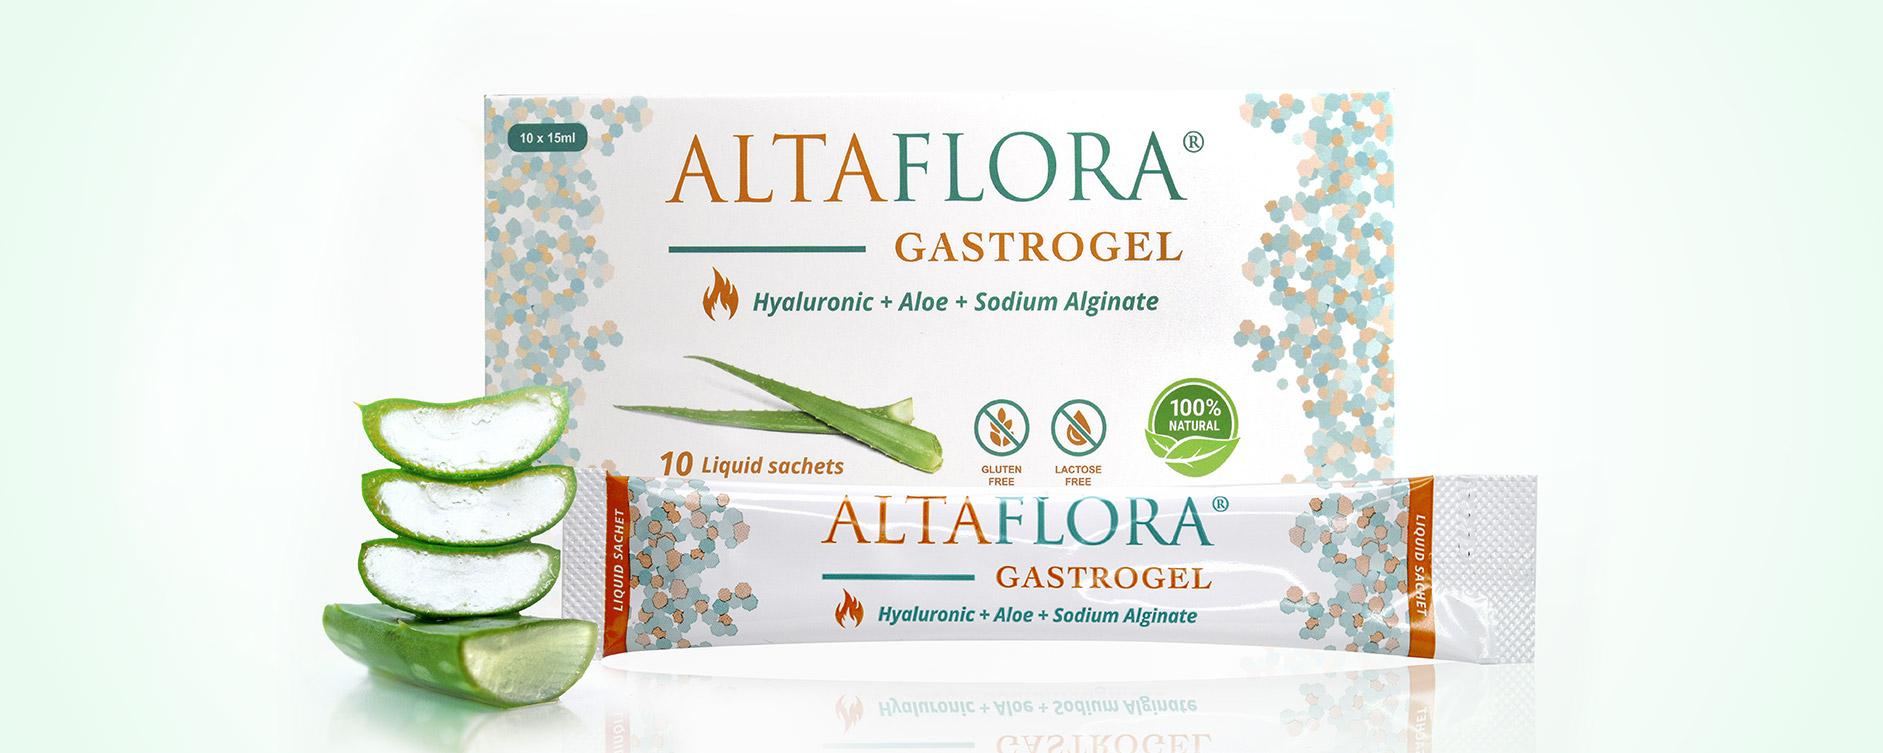 ALTAFLORA - Benessere gastrointestinale